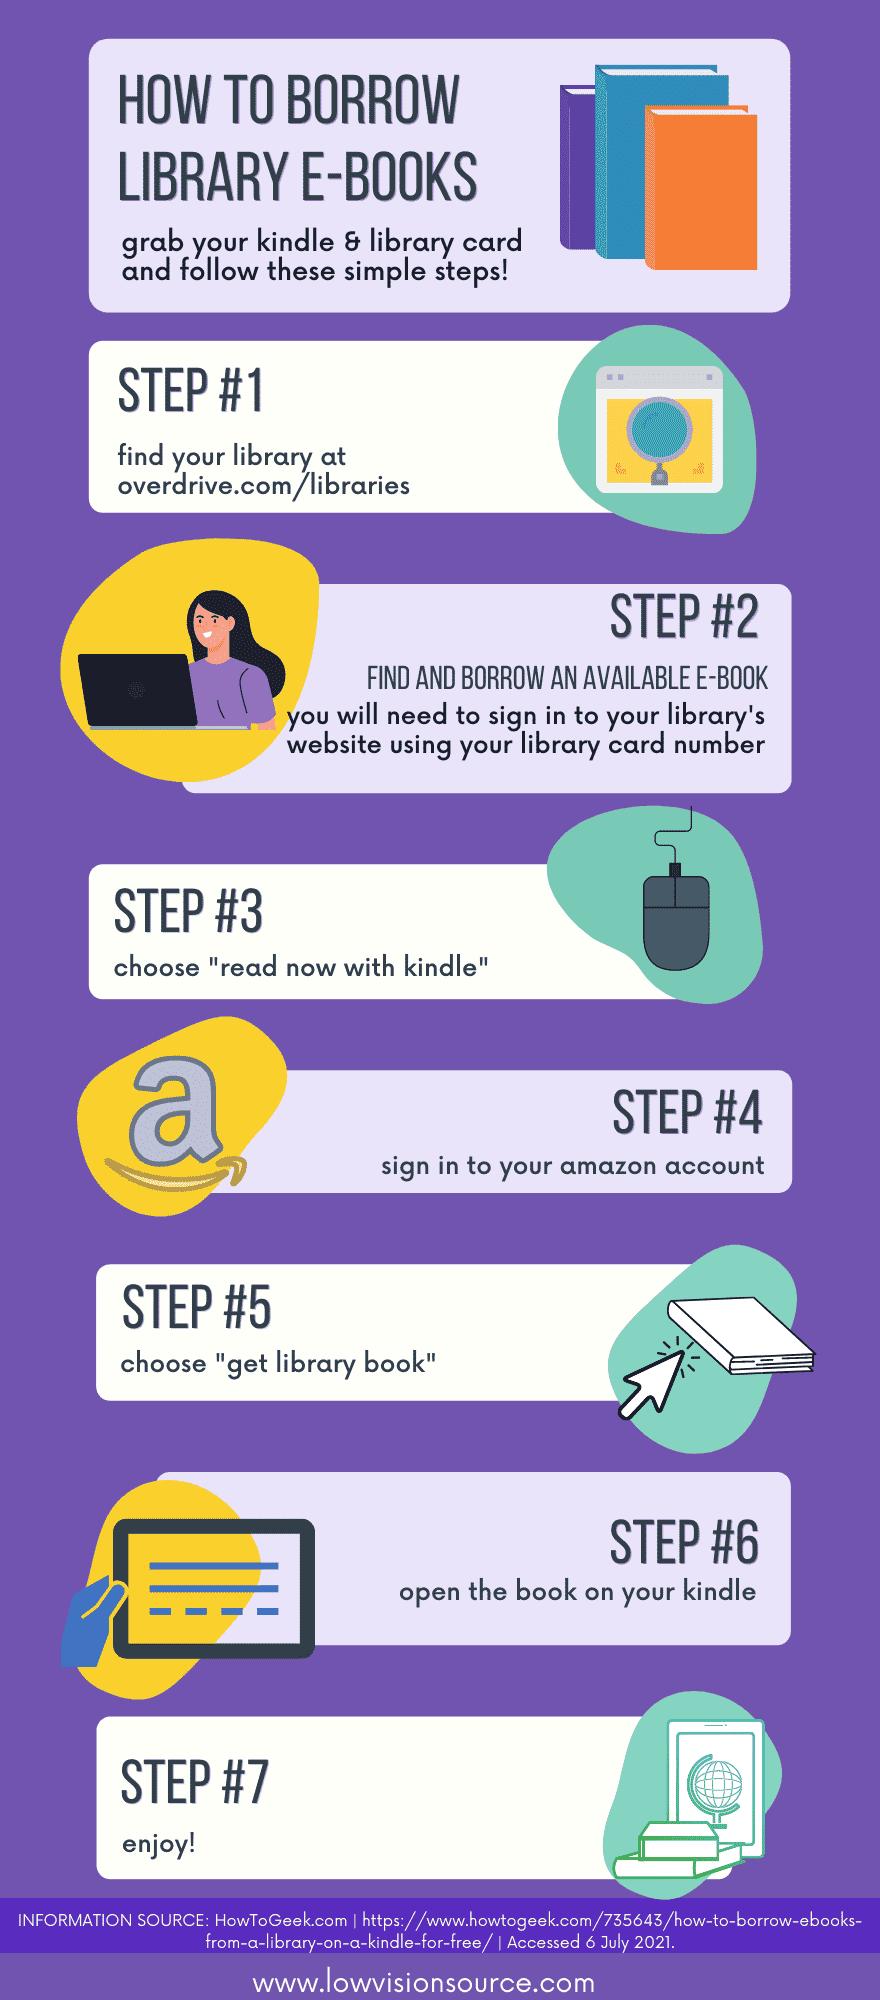 How to Borrow Library e-Books Infographic